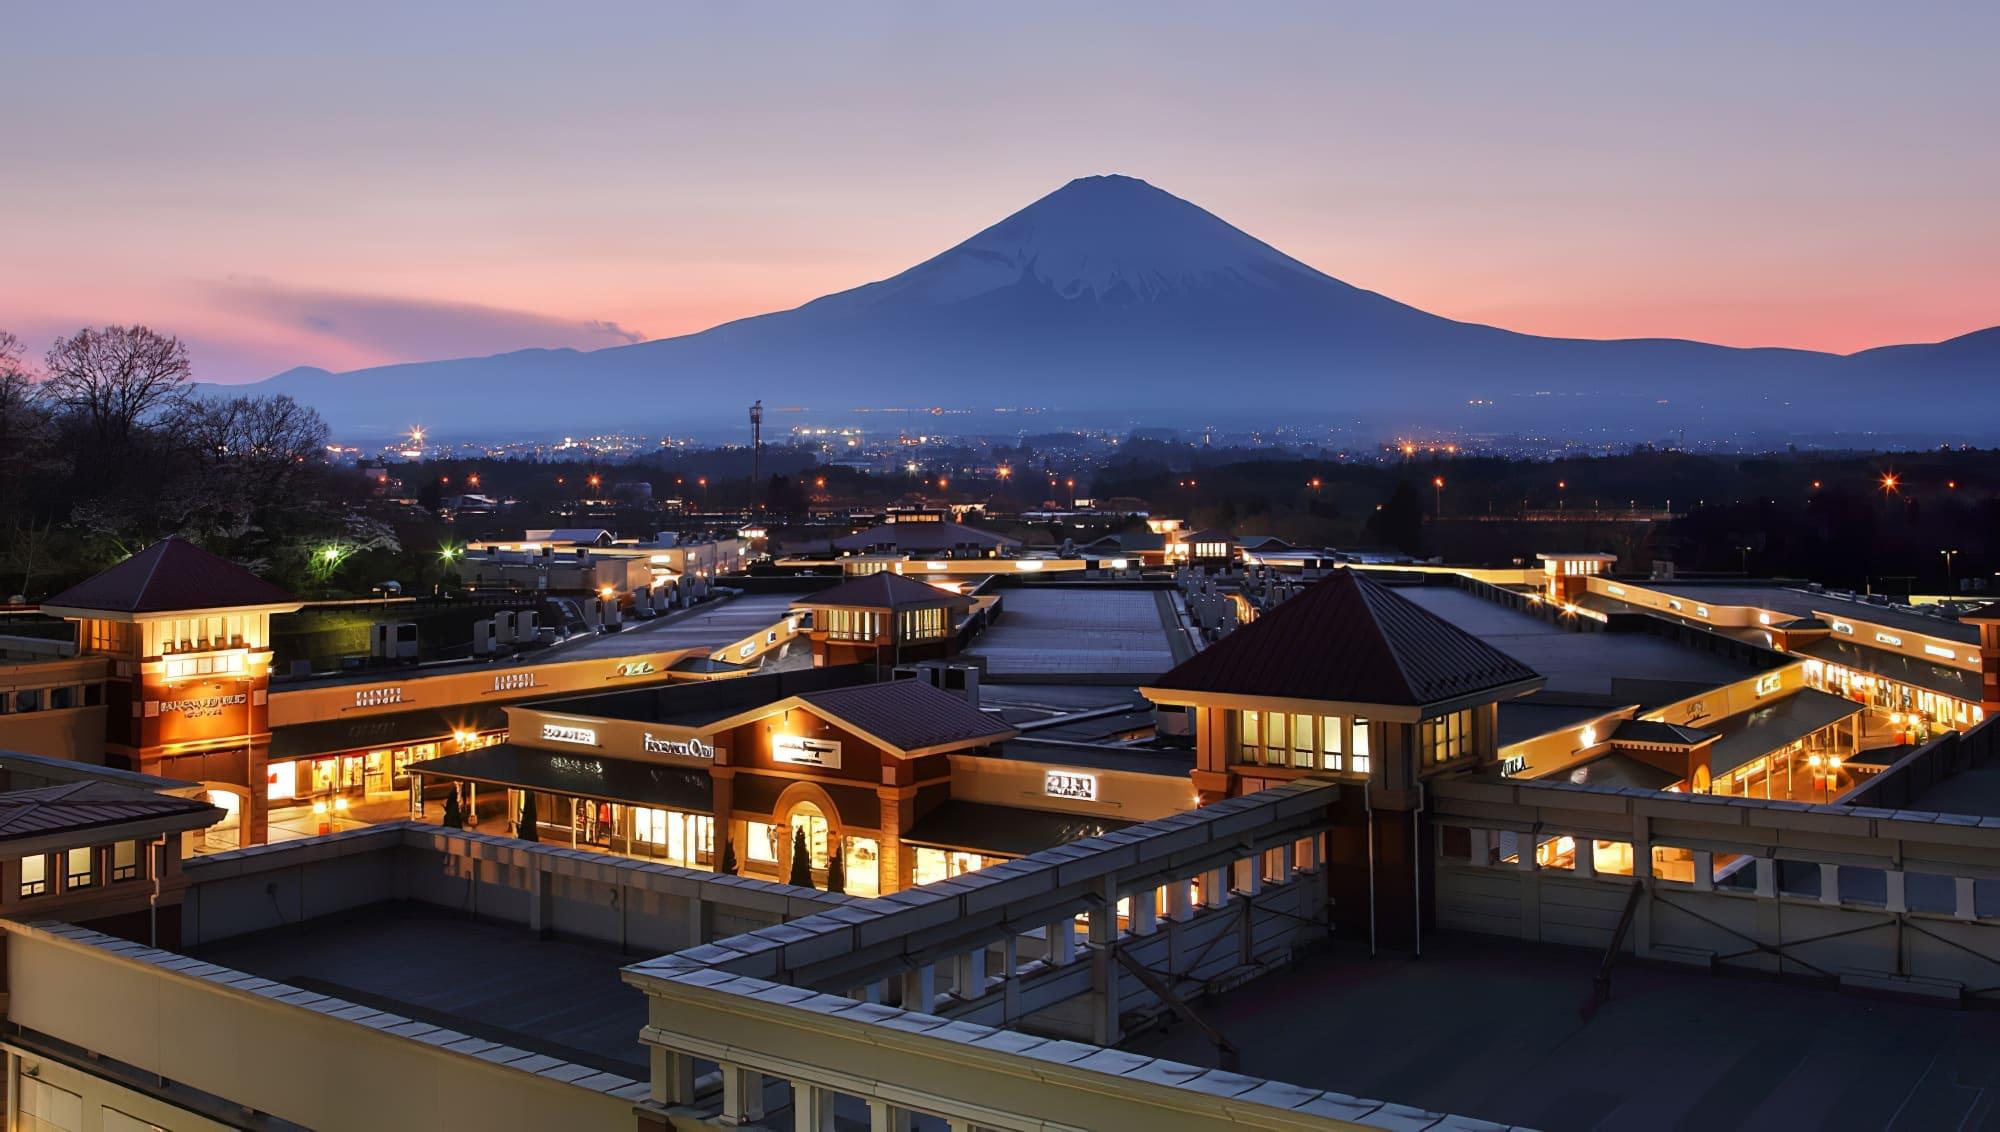 Shizuoka rencontres 100 sites de rencontres gratuits en anglais